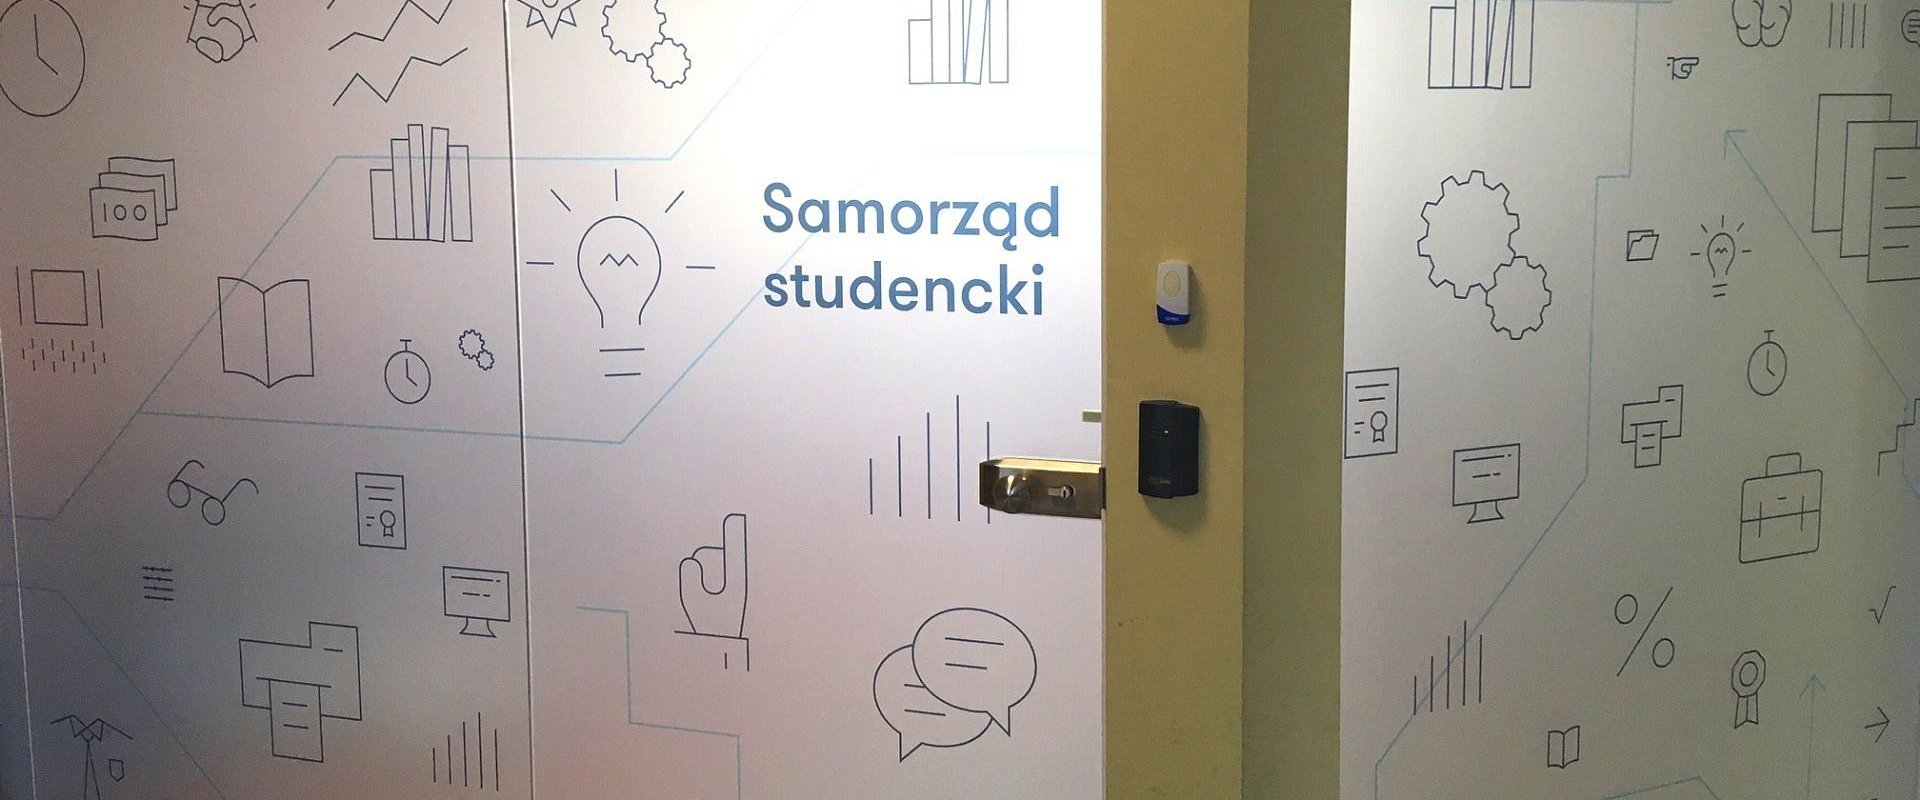 Samorząd studencki